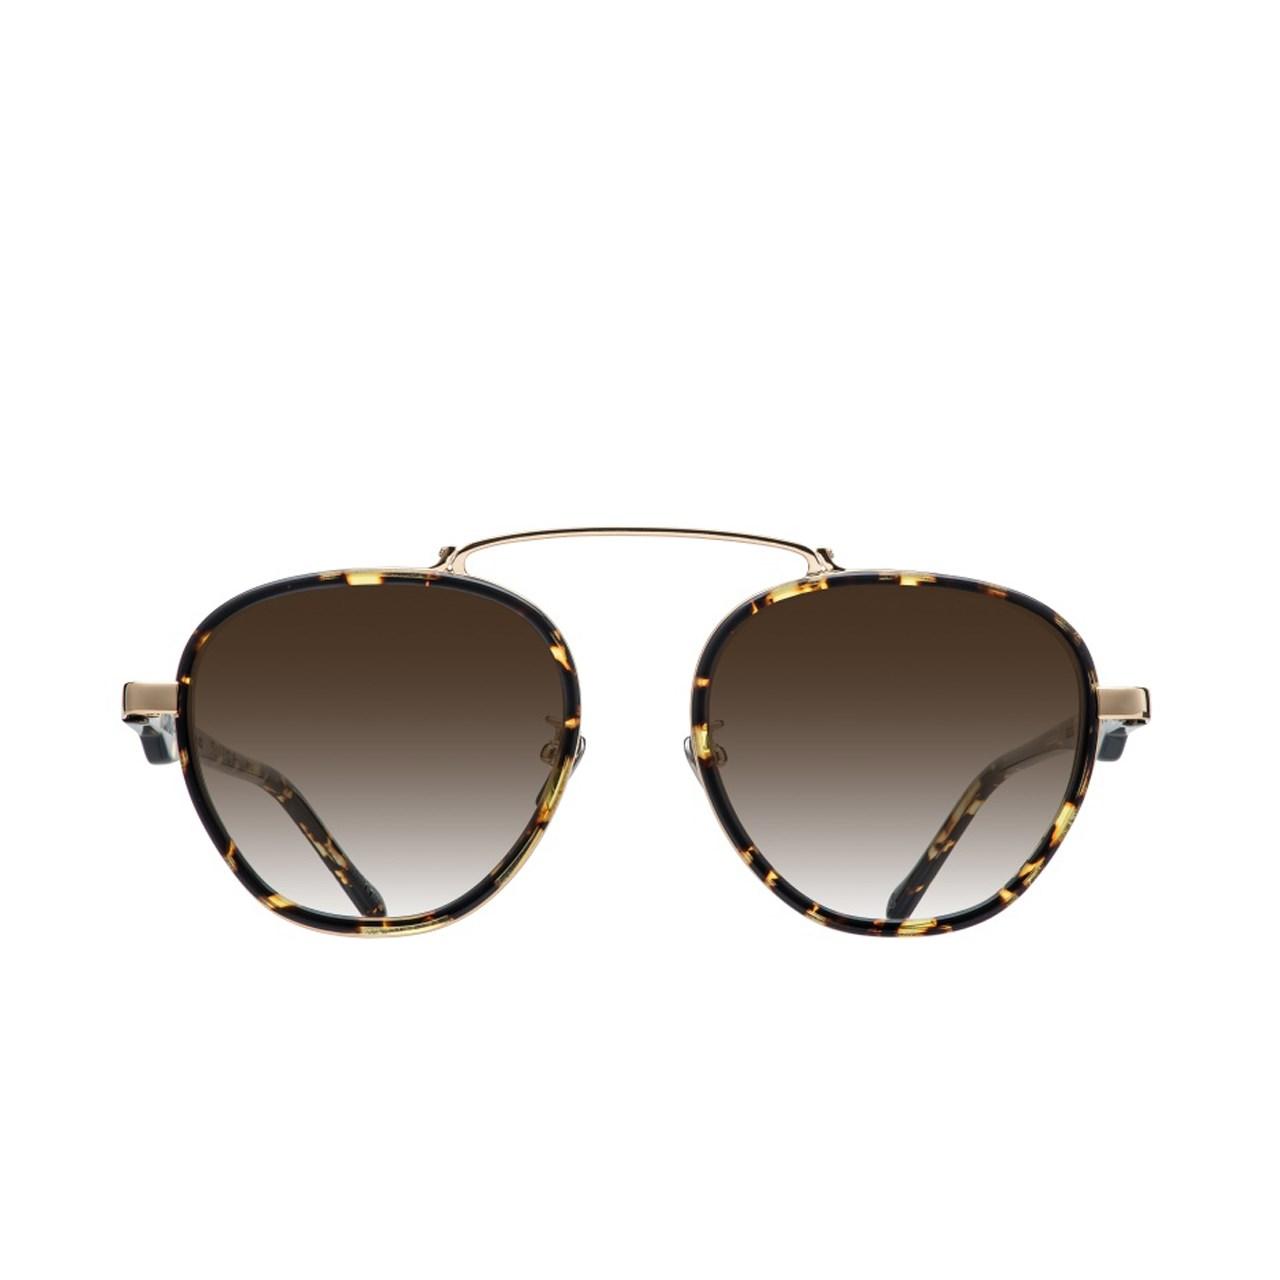 عینک آفتابی ماسادا مدل The Wild Bunch S8097-DT